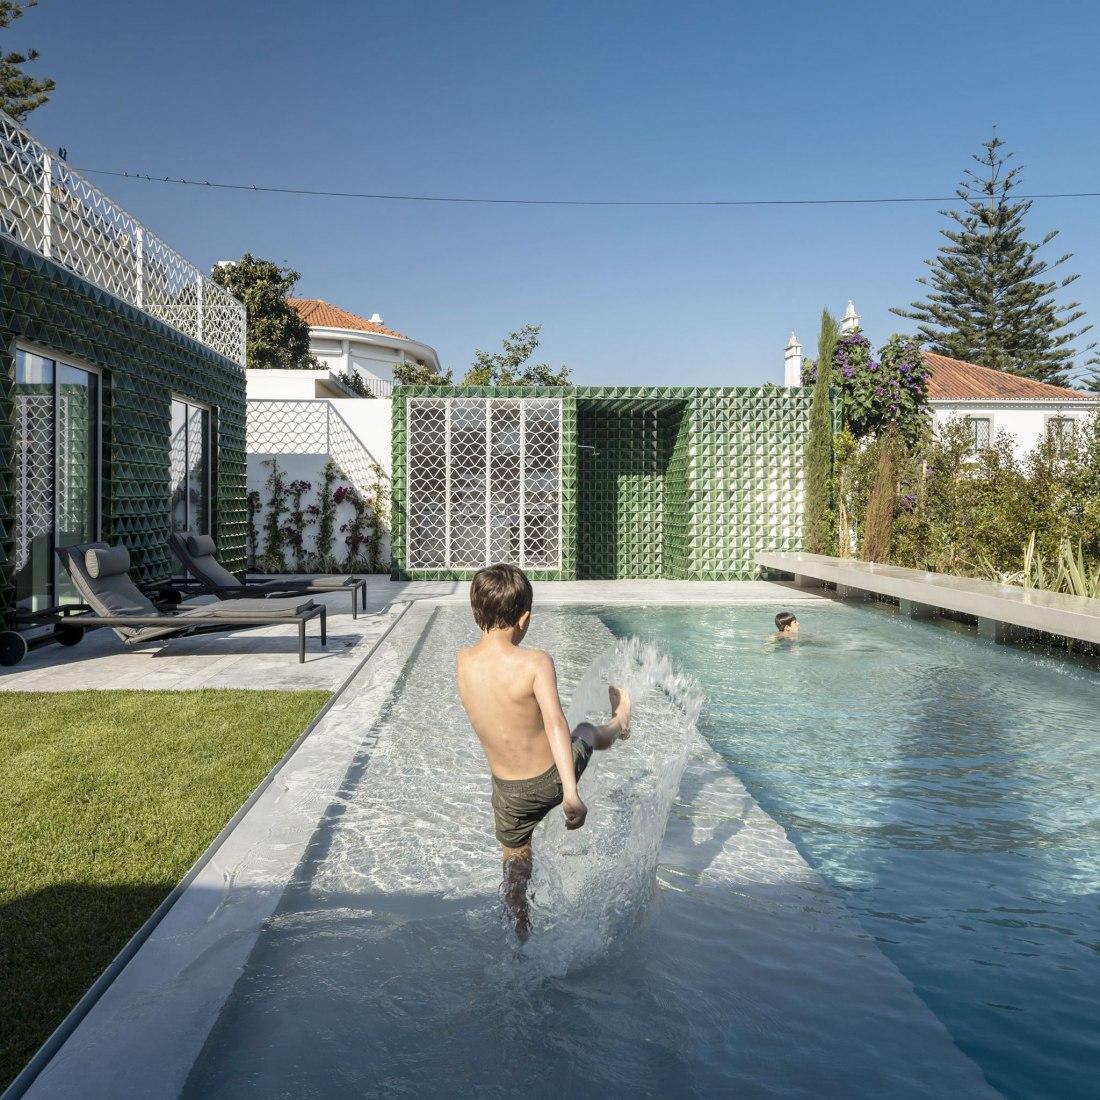 Casa Restelo AD25 por João Tiago Aguiar. Fotografía por Fernando Guerra | FG+SG